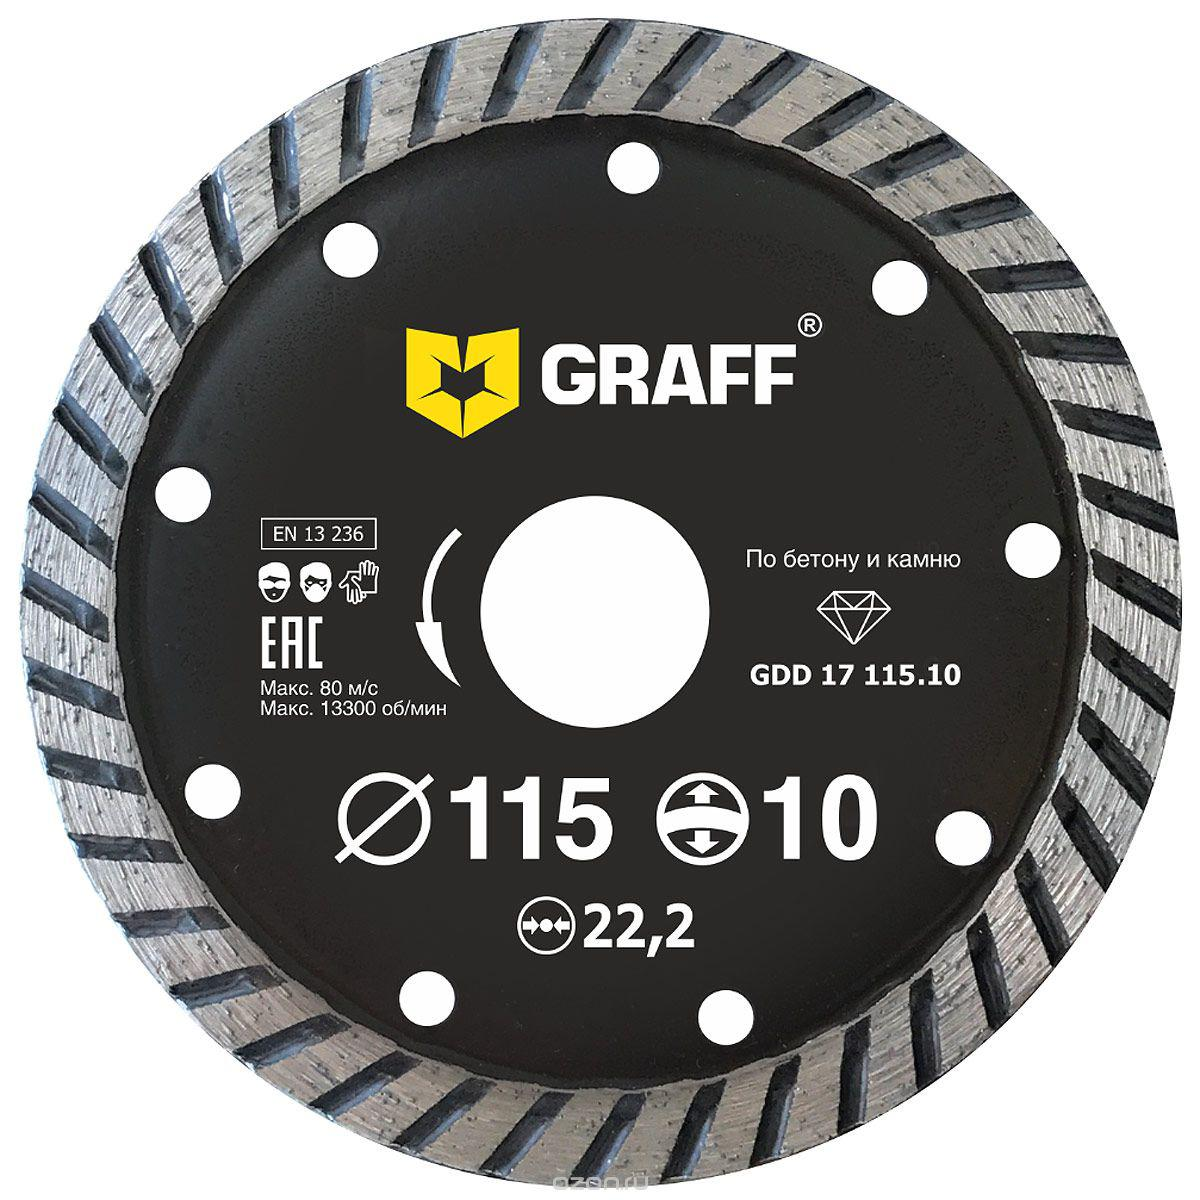 Круг алмазный Graff (gdd 17 115.10) Ф115х22мм по бетону цена и фото